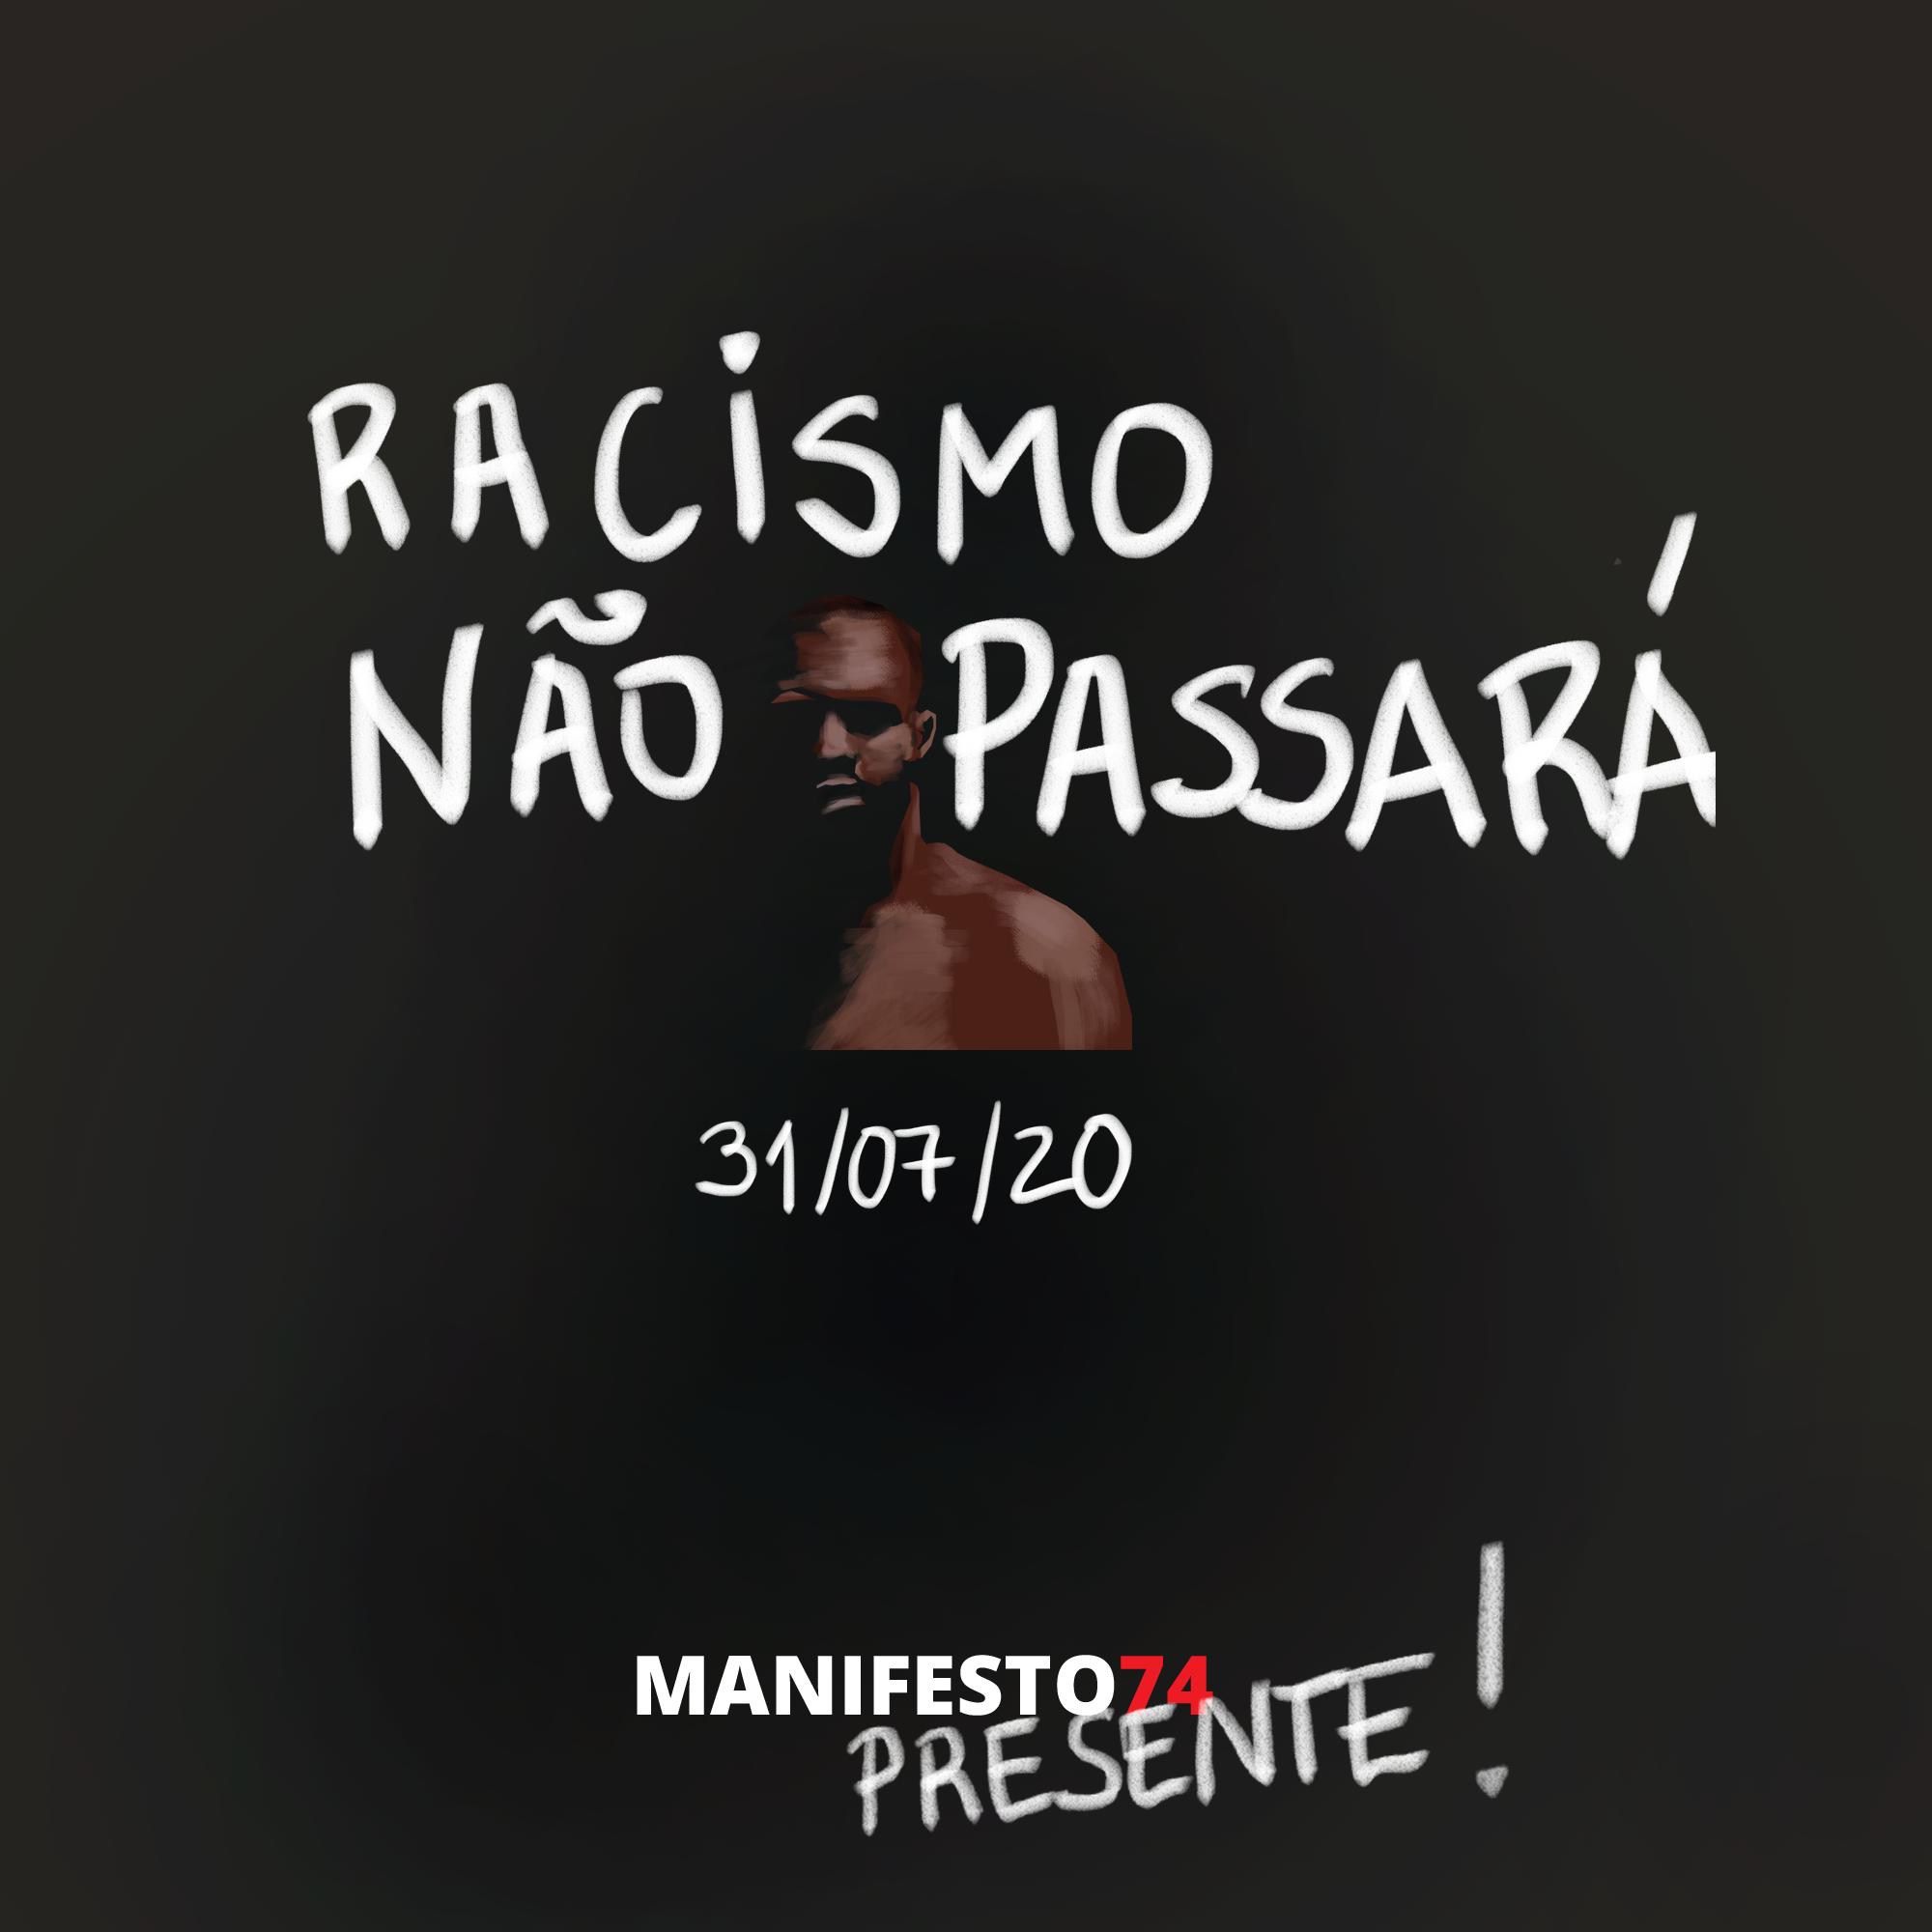 racismo nao passara